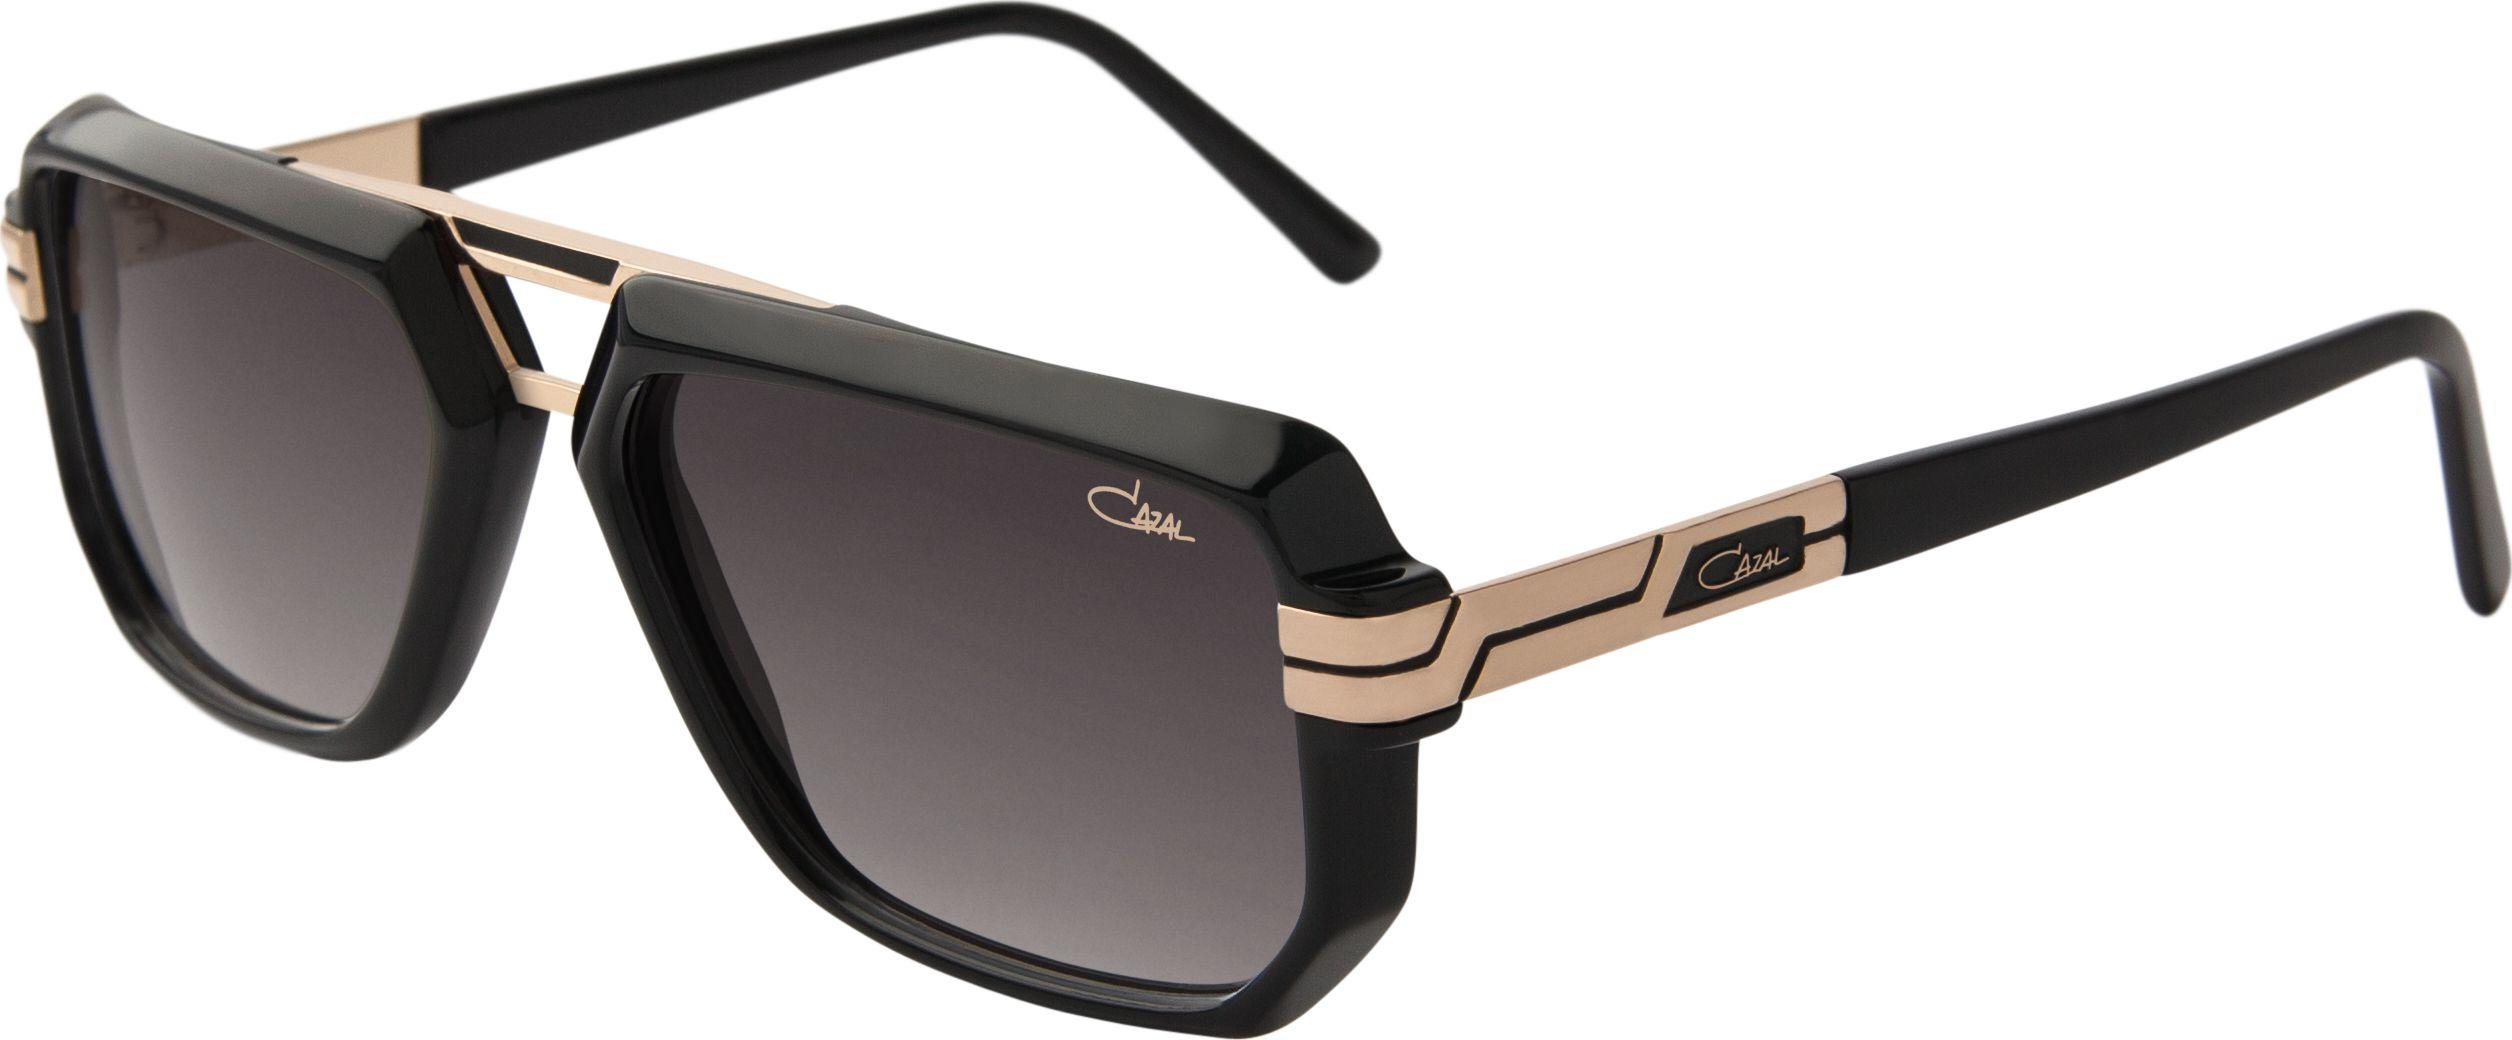 bb7e1fbe196 Cazal 6013 Progressive Prescription Eyeglasses FREE S H CZ6013001PR ...